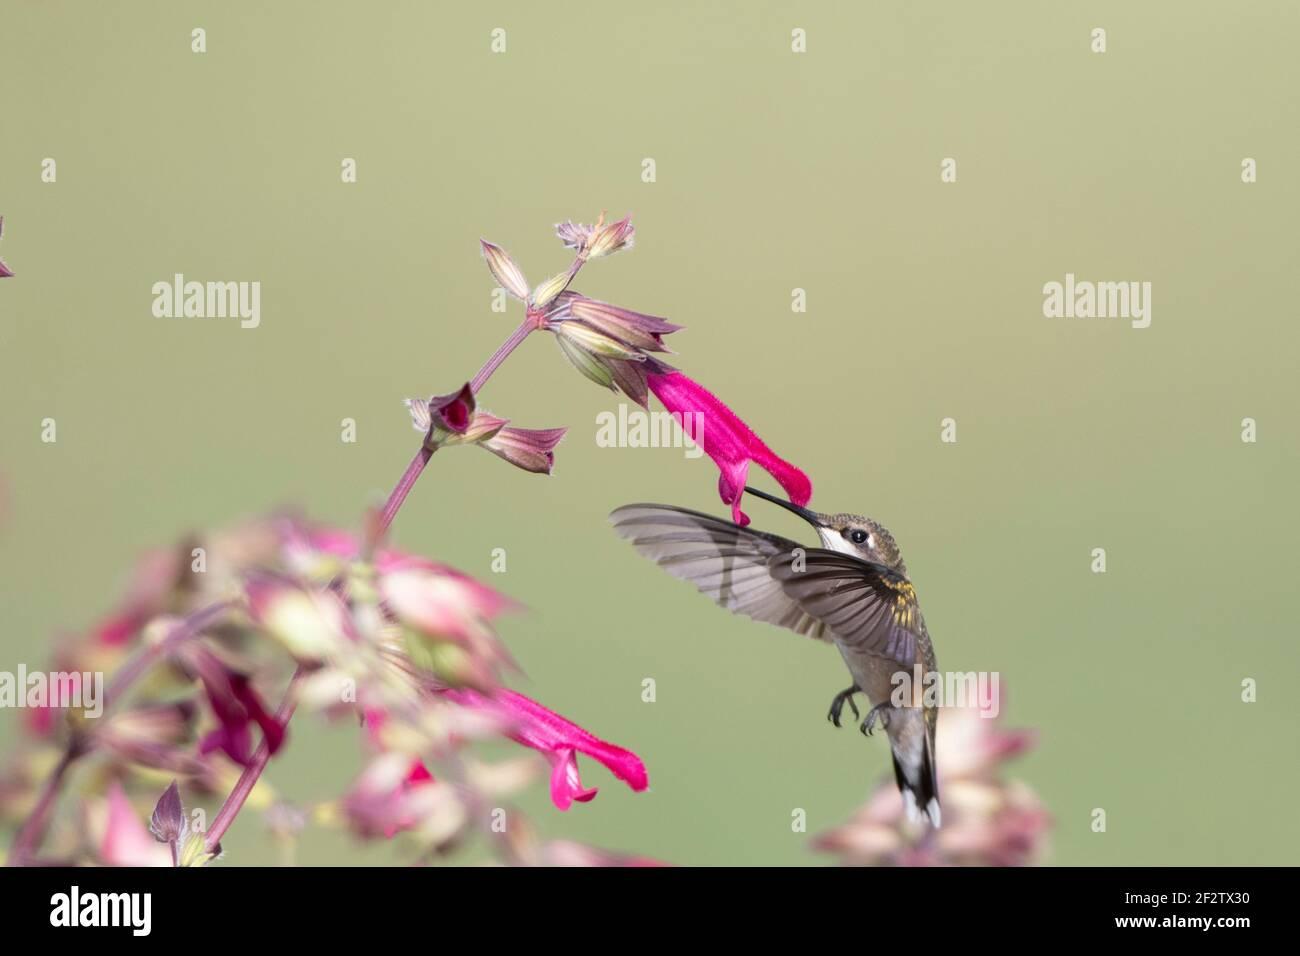 01162-16906 Hummingbird de garganta rubí (Archilochus colubris) en Salvia Fuchsia 'Rockin Fuchsia' (Salvia hybrid) Marion Co. IL Foto de stock